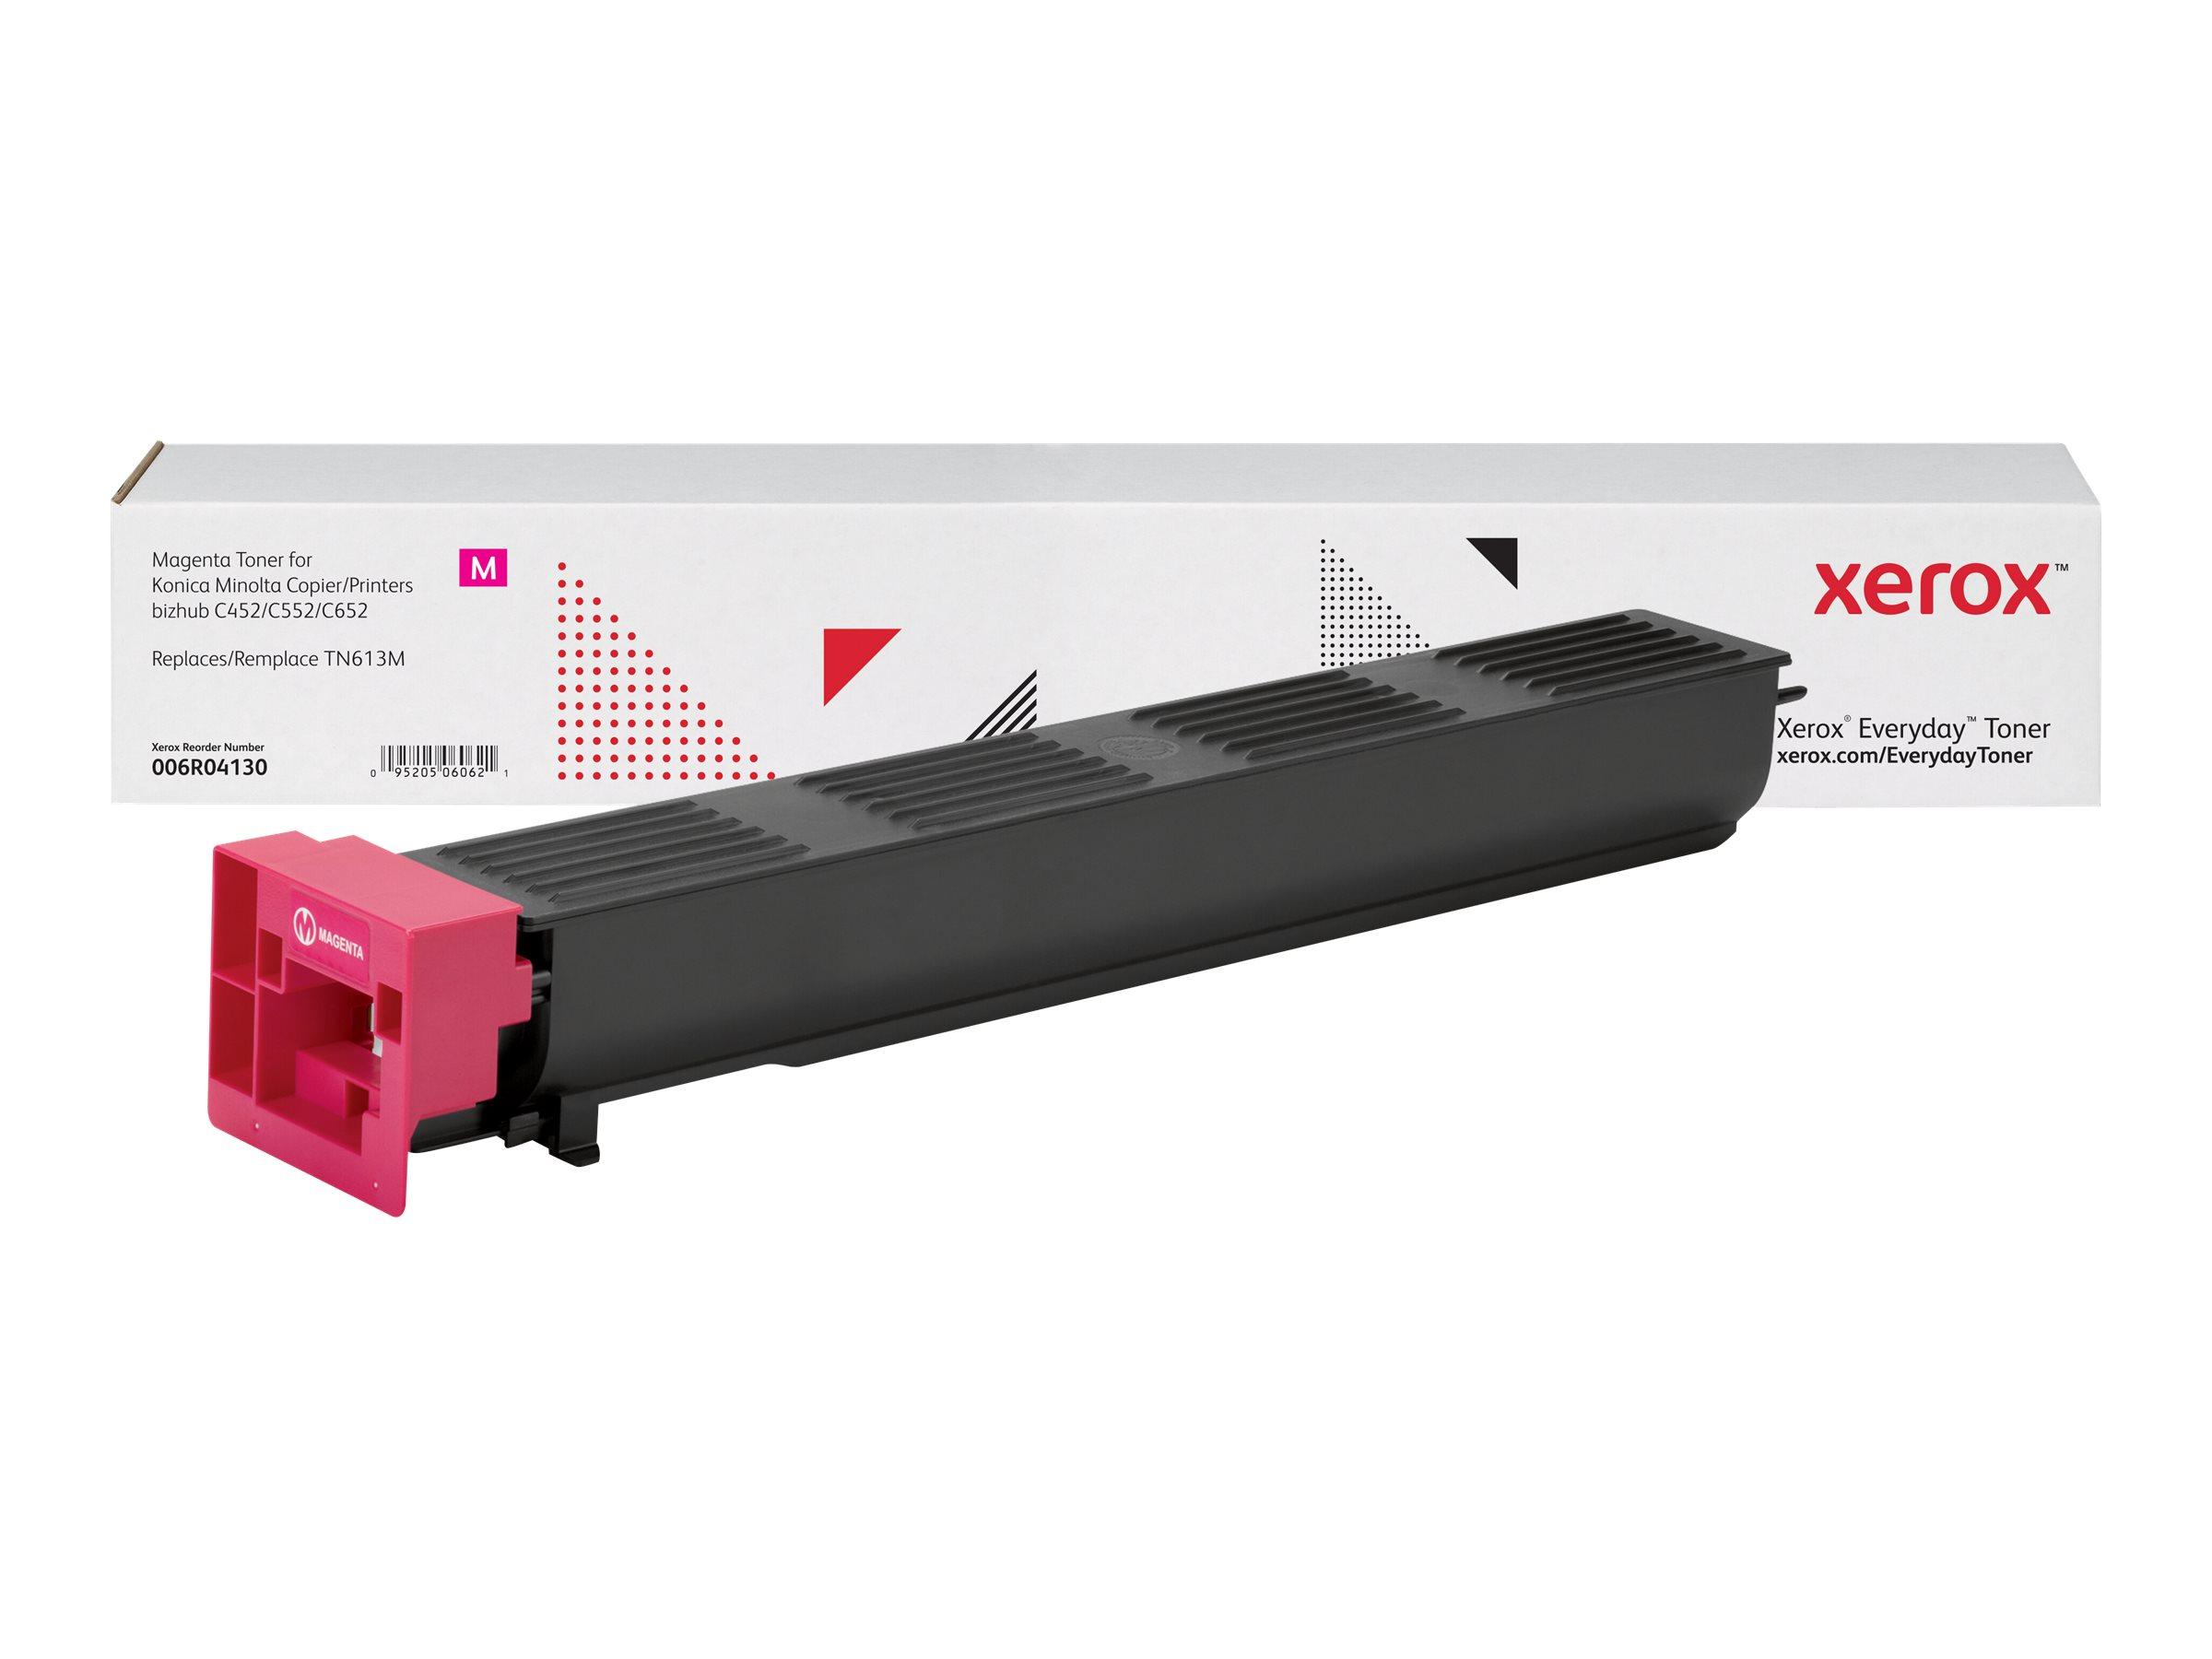 Xerox Everyday - magenta - toner cartridge (alternative for: Konica Minolta A0TM330)